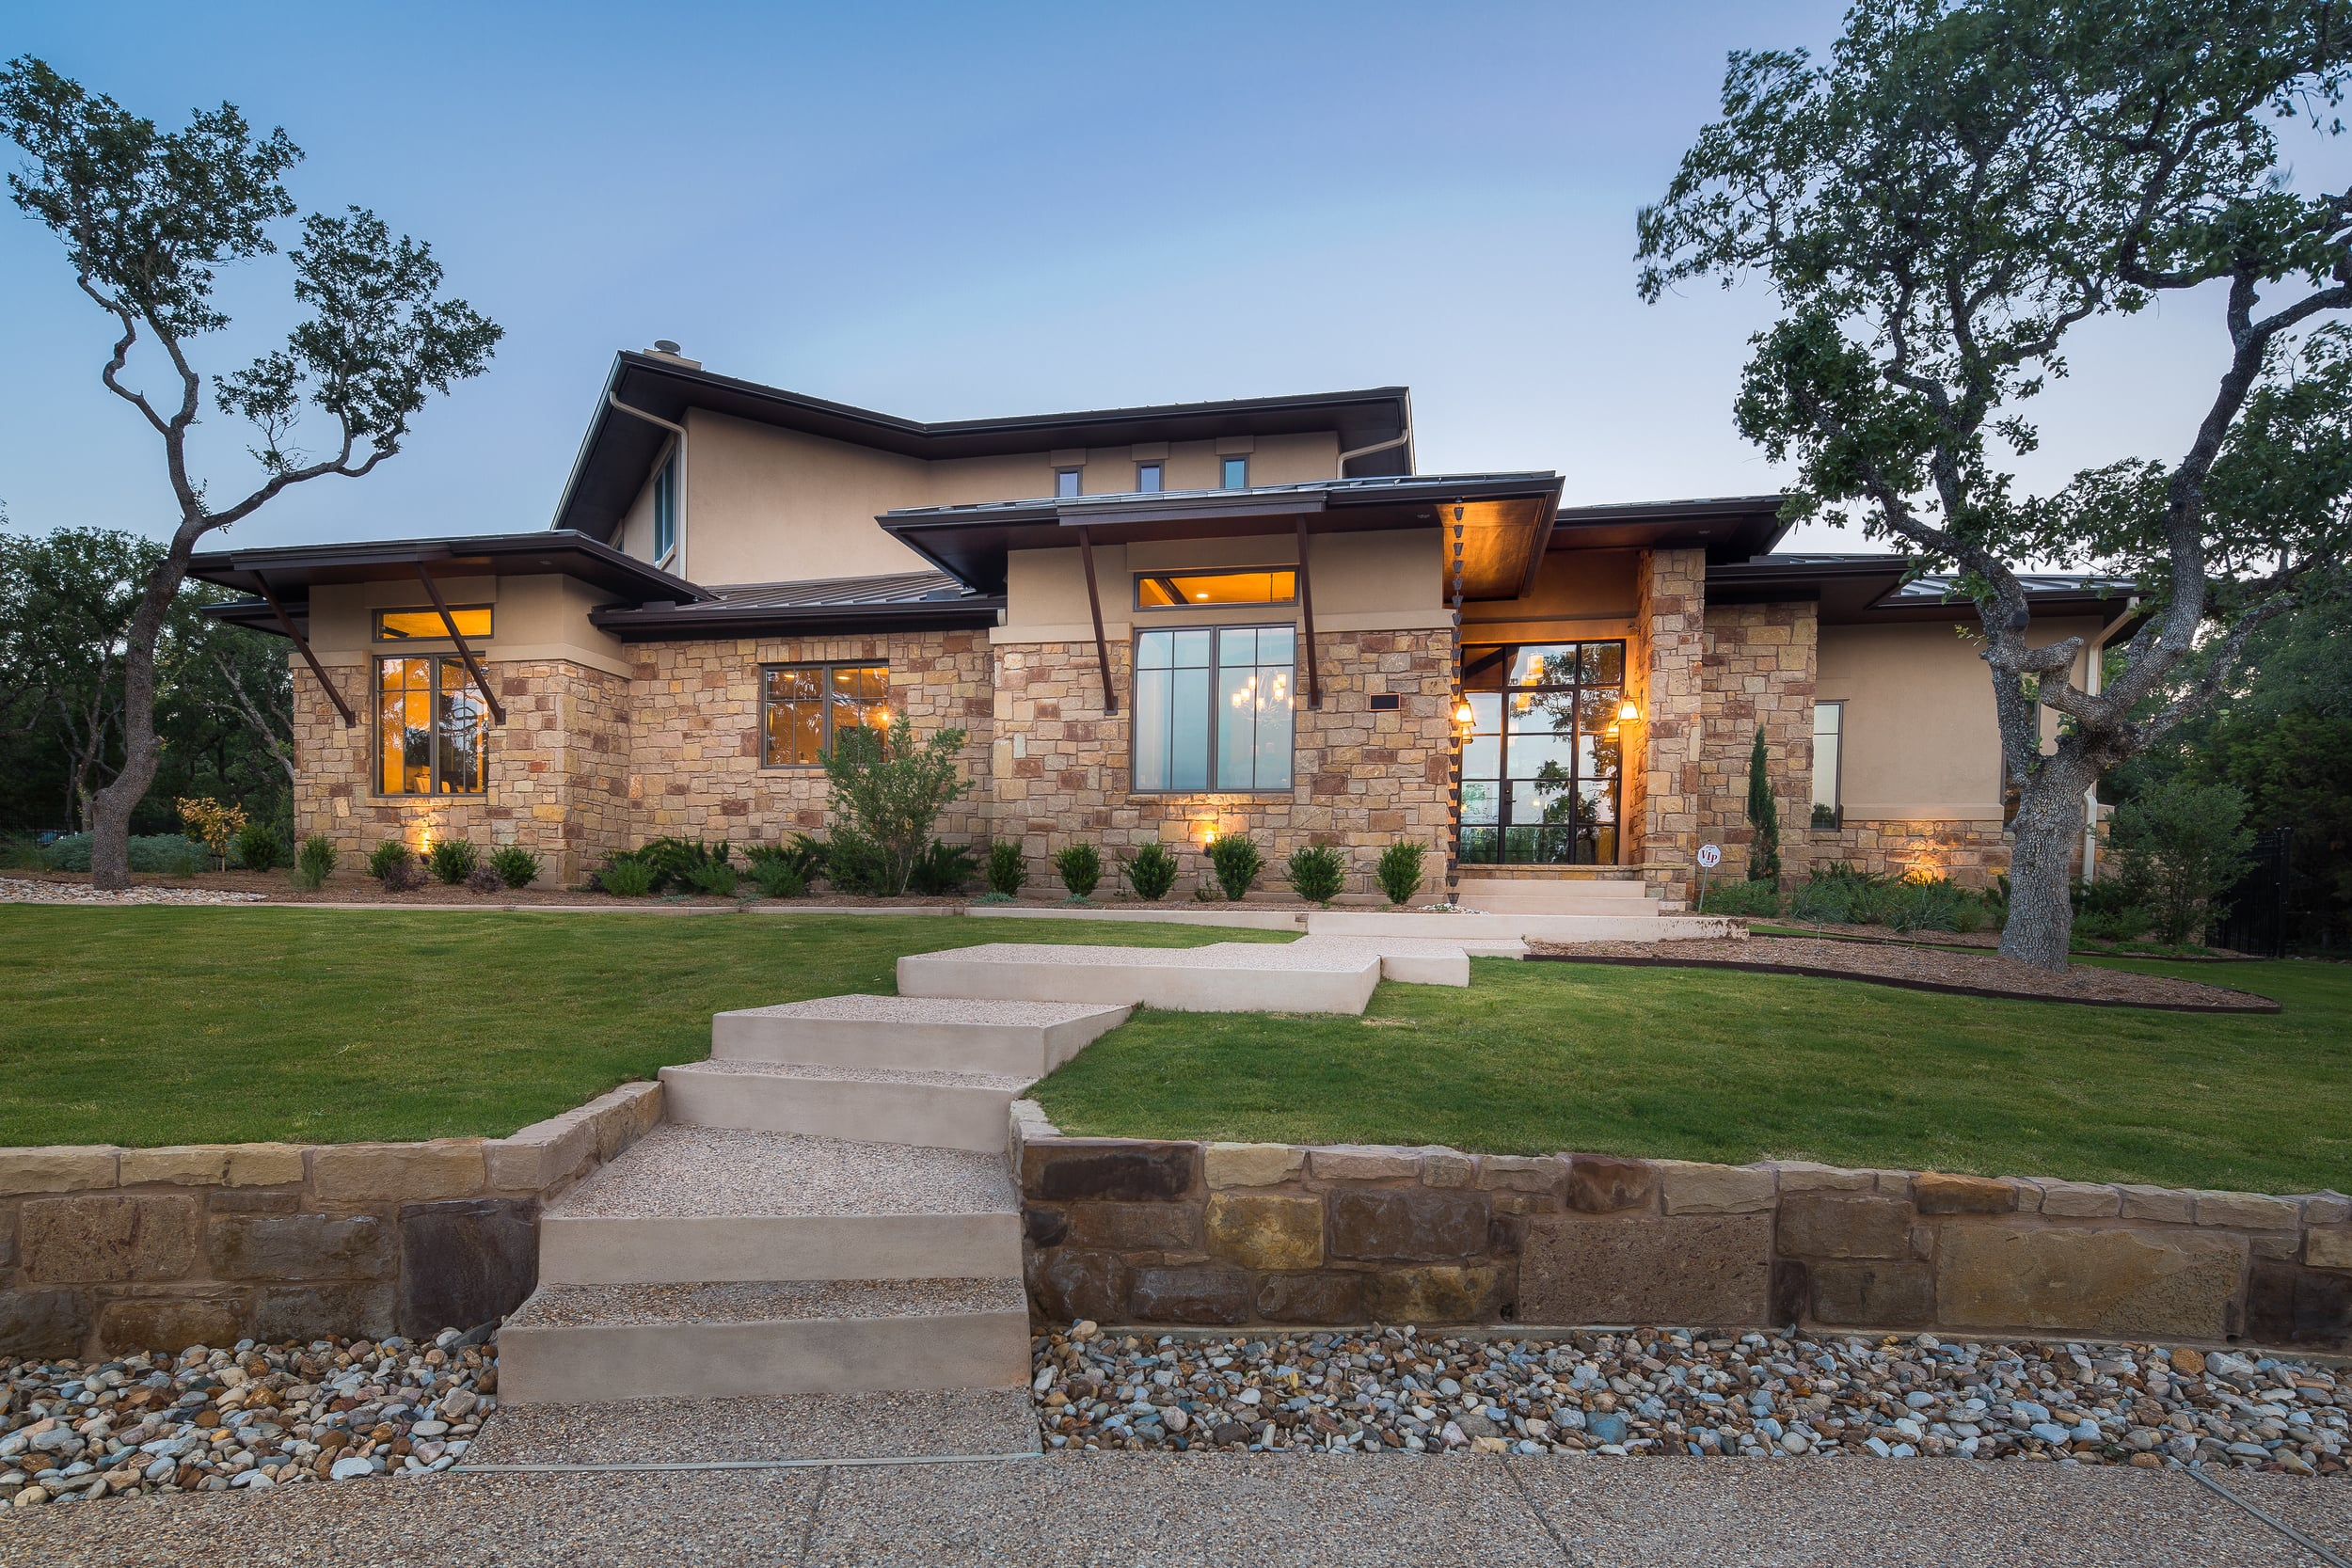 jbryantboyd-innovation-luxury-homes-1.jpg